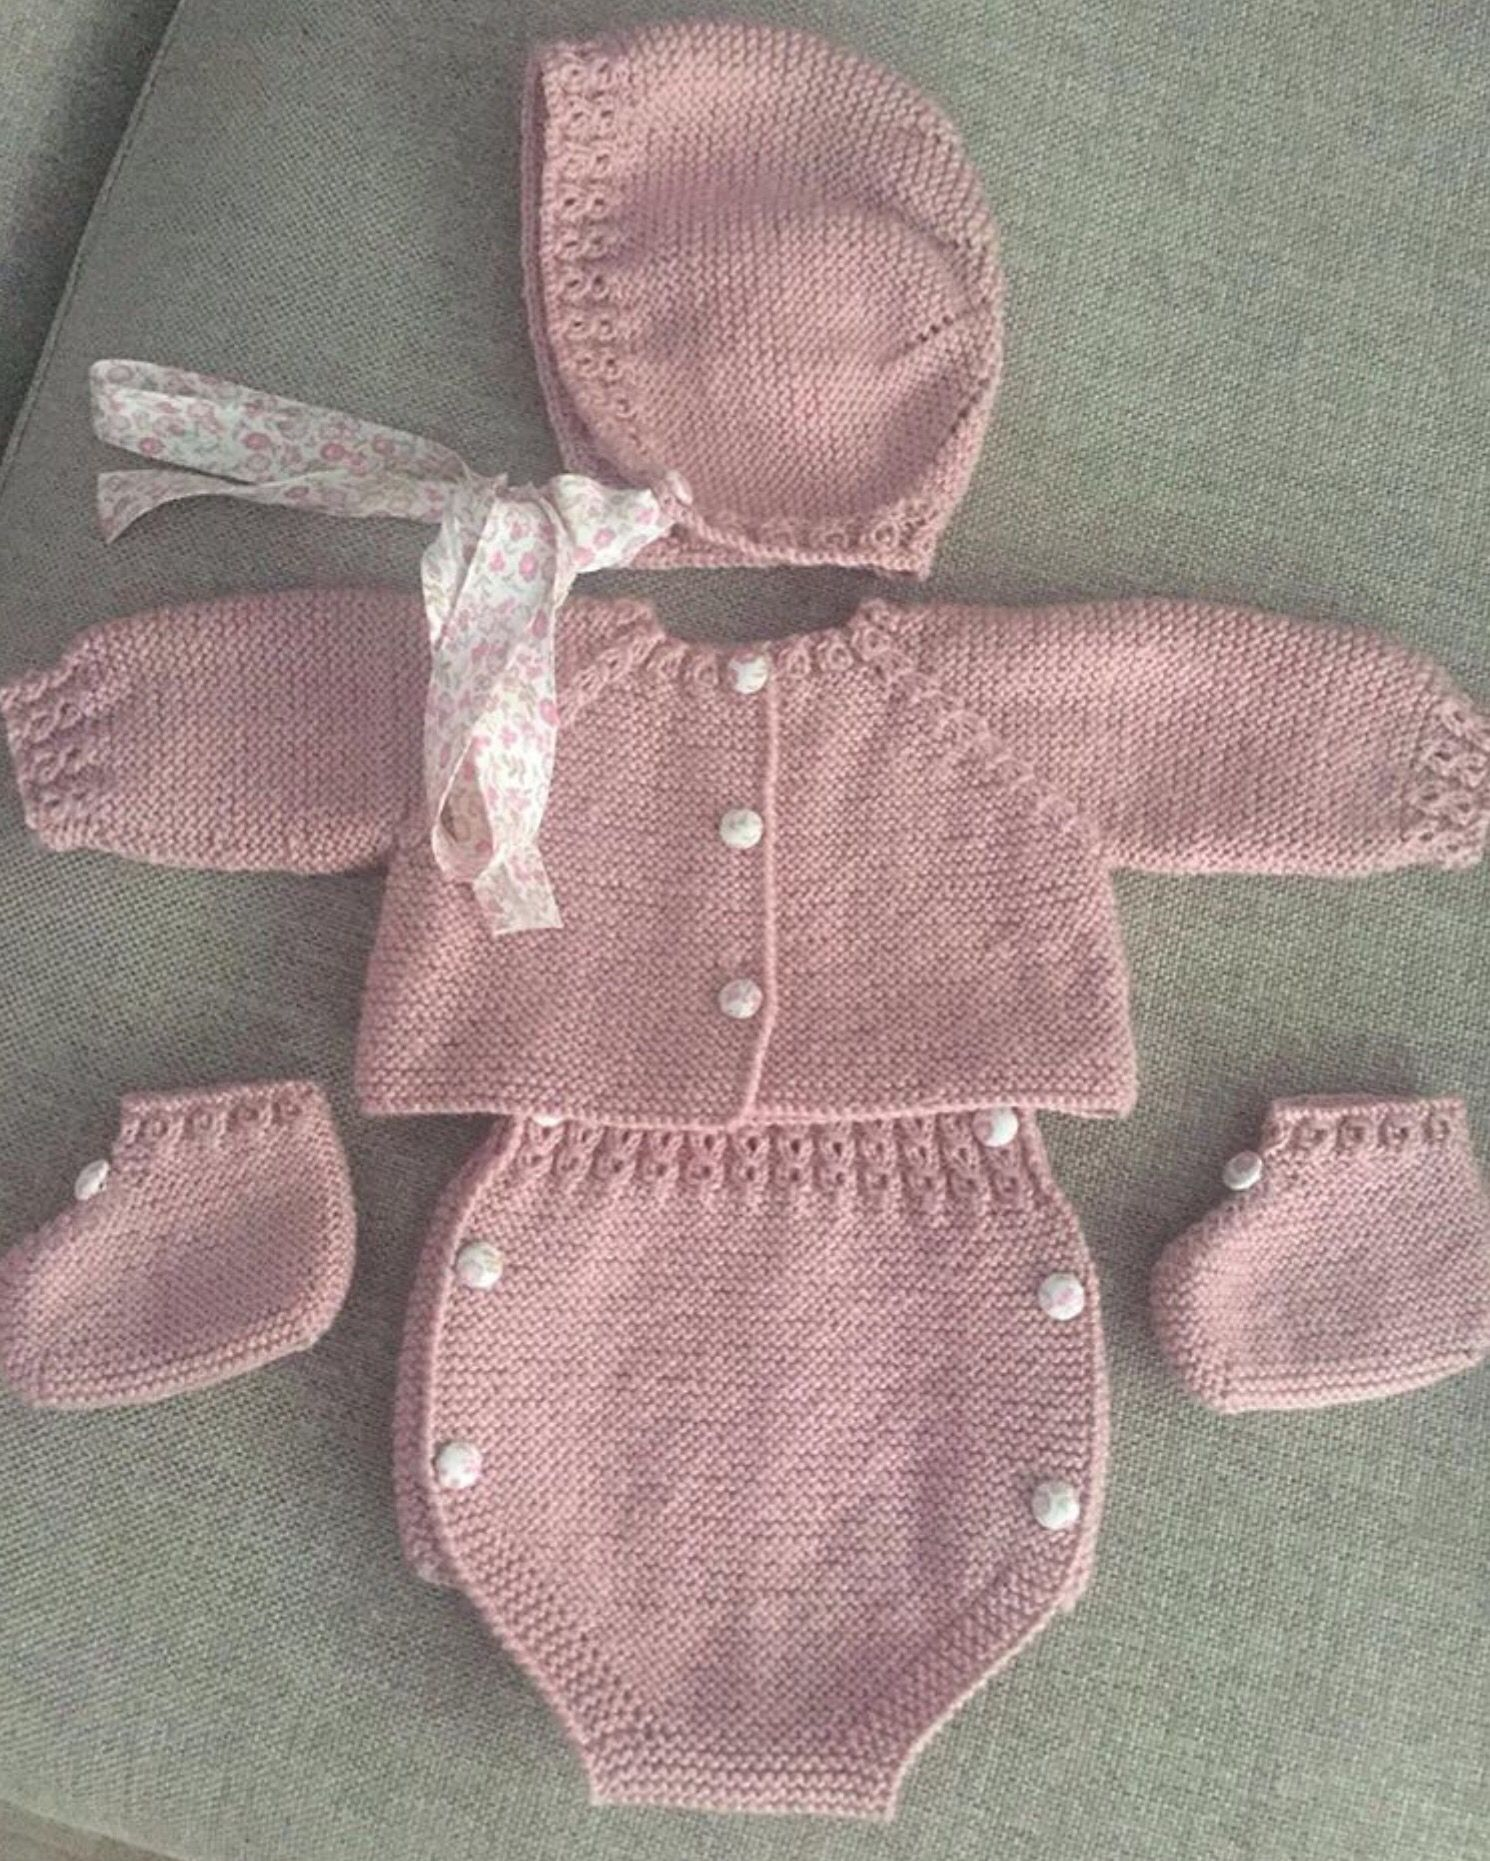 Club de labores madrid a crochet nena pinterest - Labores de crochet para bebes ...